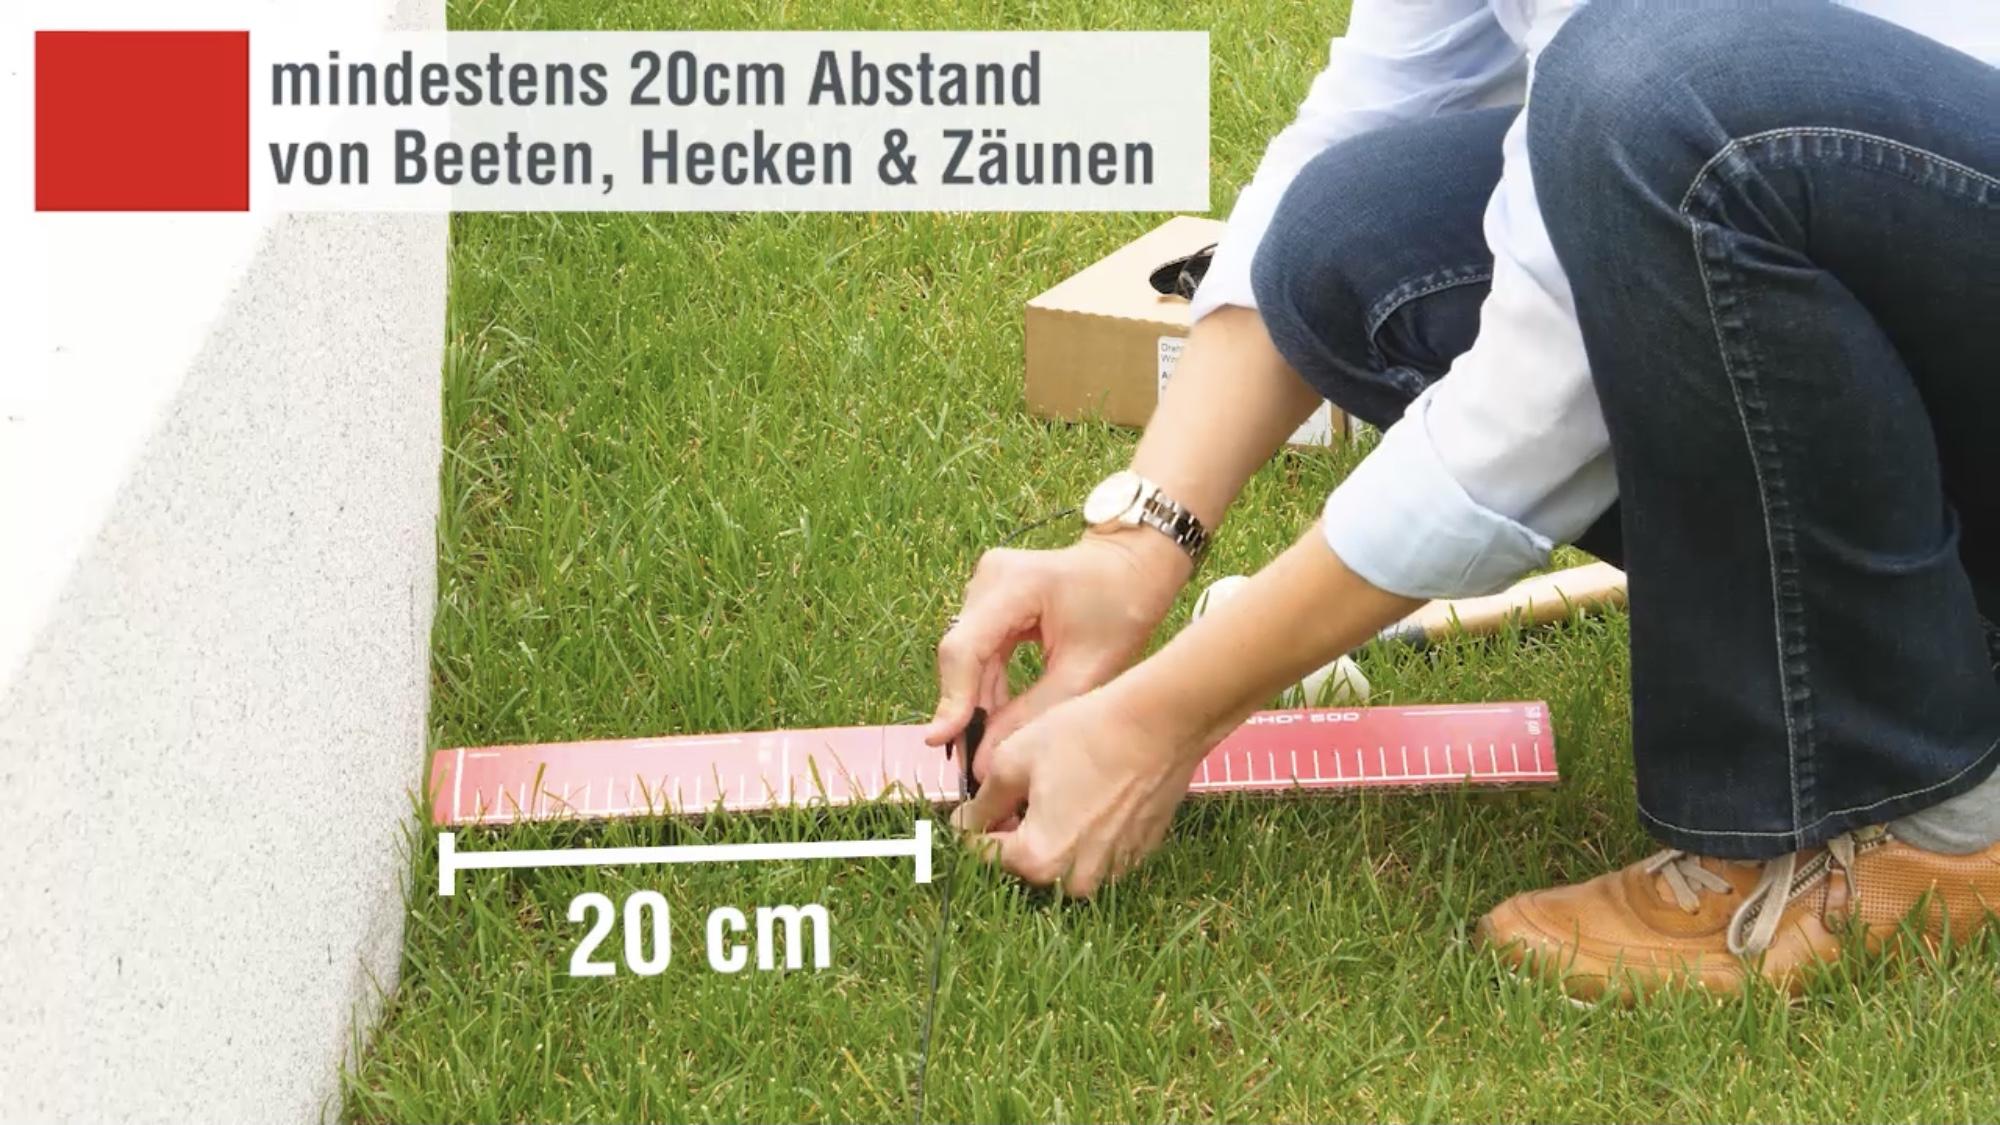 AL-KO-Robolinho-20cm-Abstand-zu-festen-Grenzen